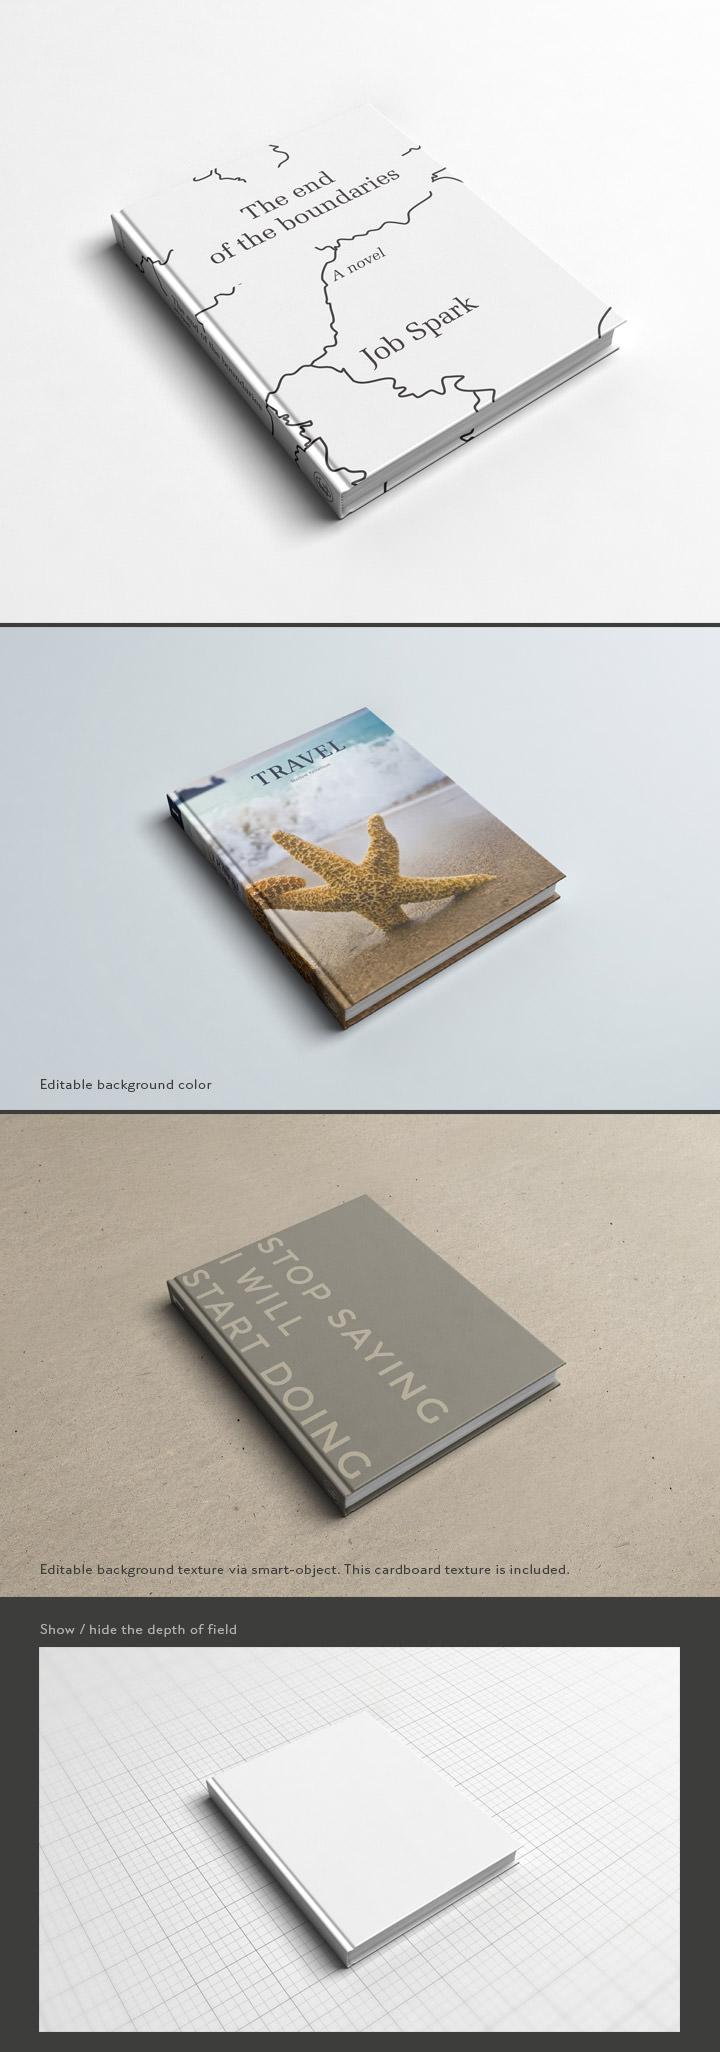 Book Cover Design Mockup Psd : Book cover mockup freecreatives